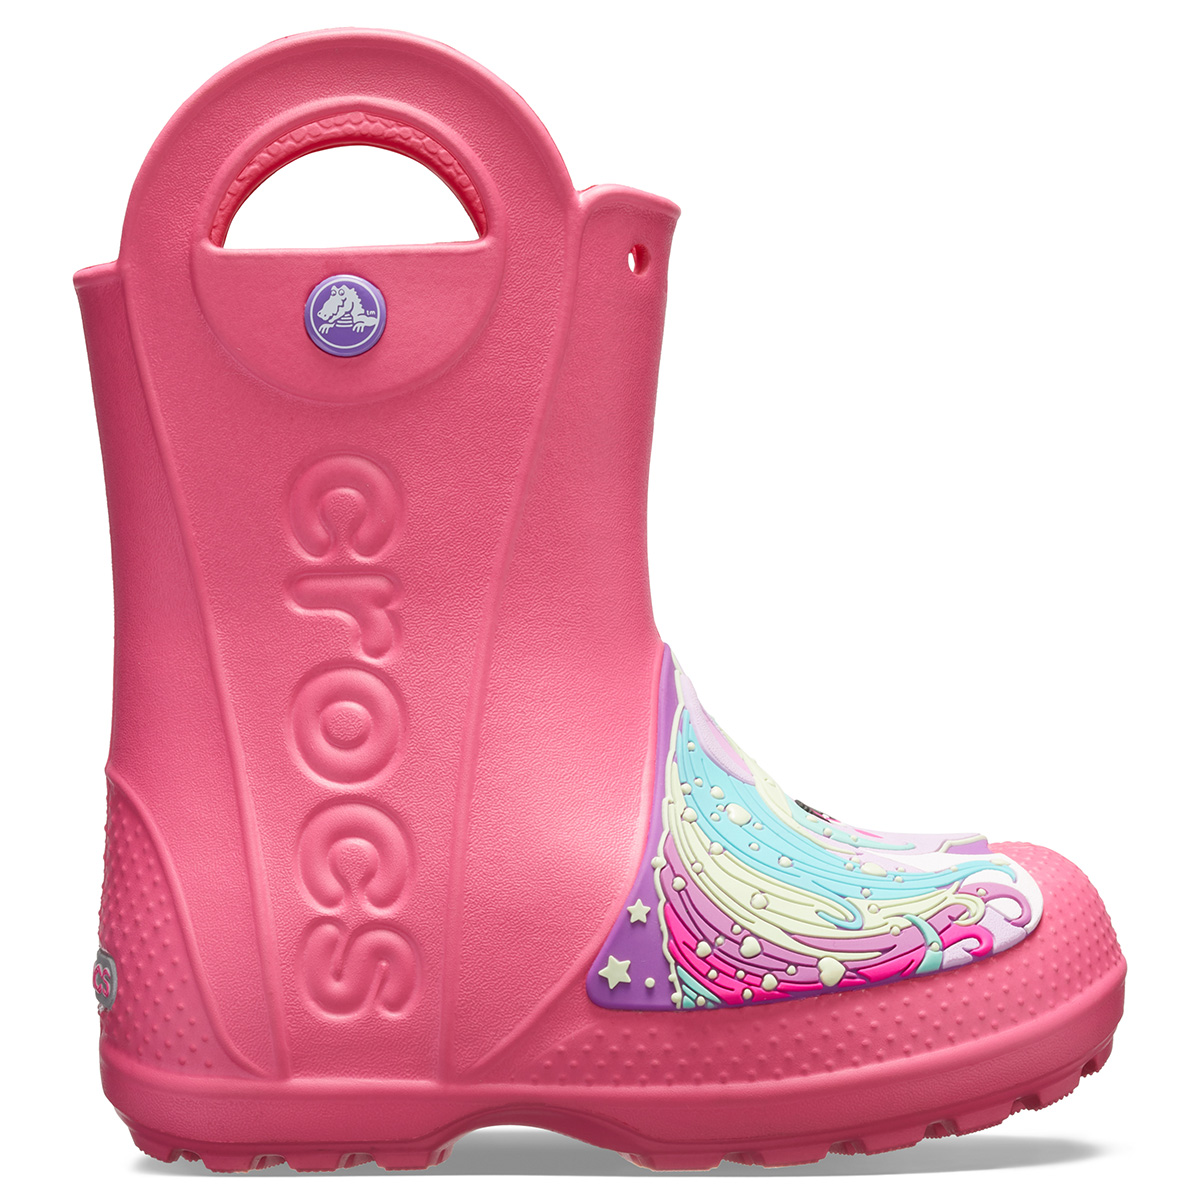 Crocs FL Creature Rain Boot K - Cennet Pembe - Cennet Pembesi